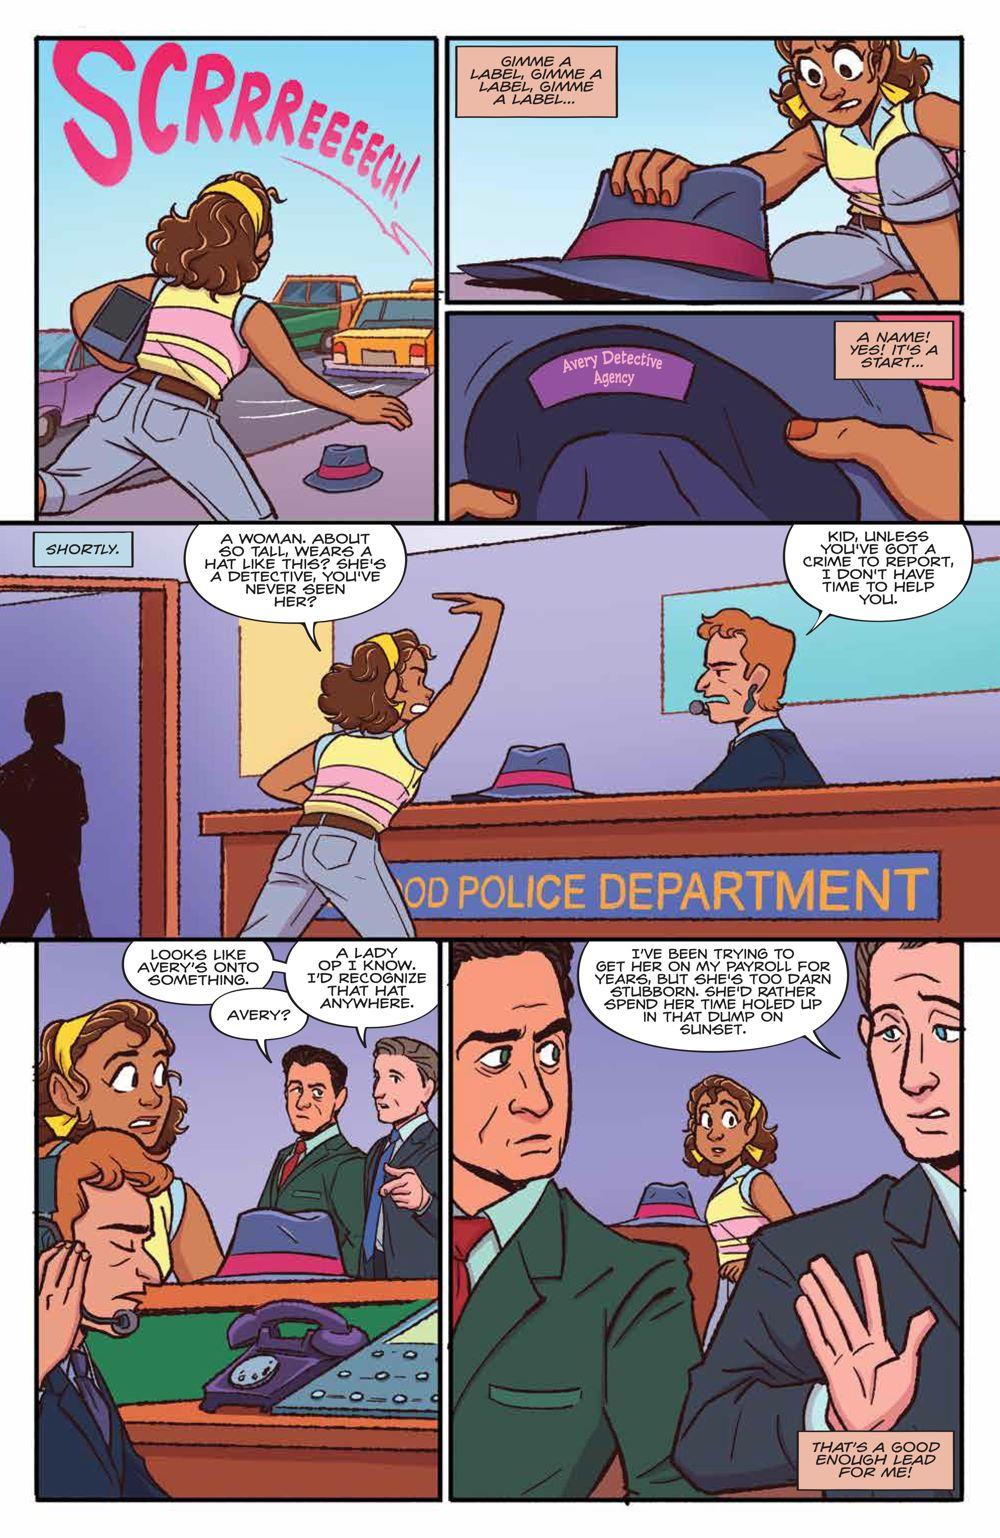 GoldieVance_OGN_LaLaLarceny_SC_PRESS_17 ComicList Previews: GOLDIE VANCE VOLUME 5 LARCENY IN LA LA LAND TP